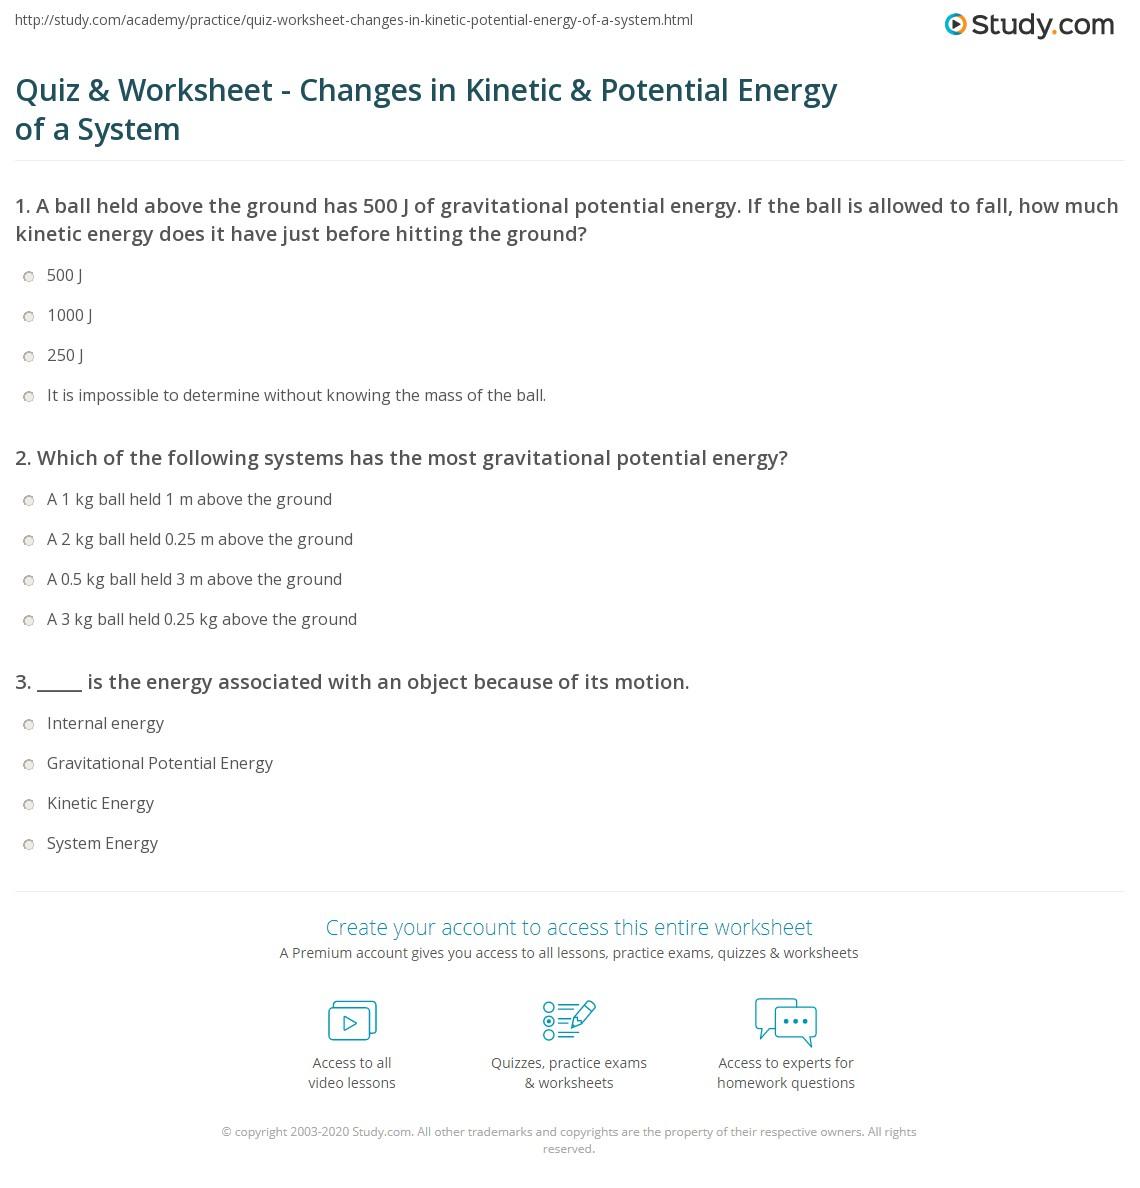 Quiz & Worksheet - Changes in Kinetic & Potential Energy of ...